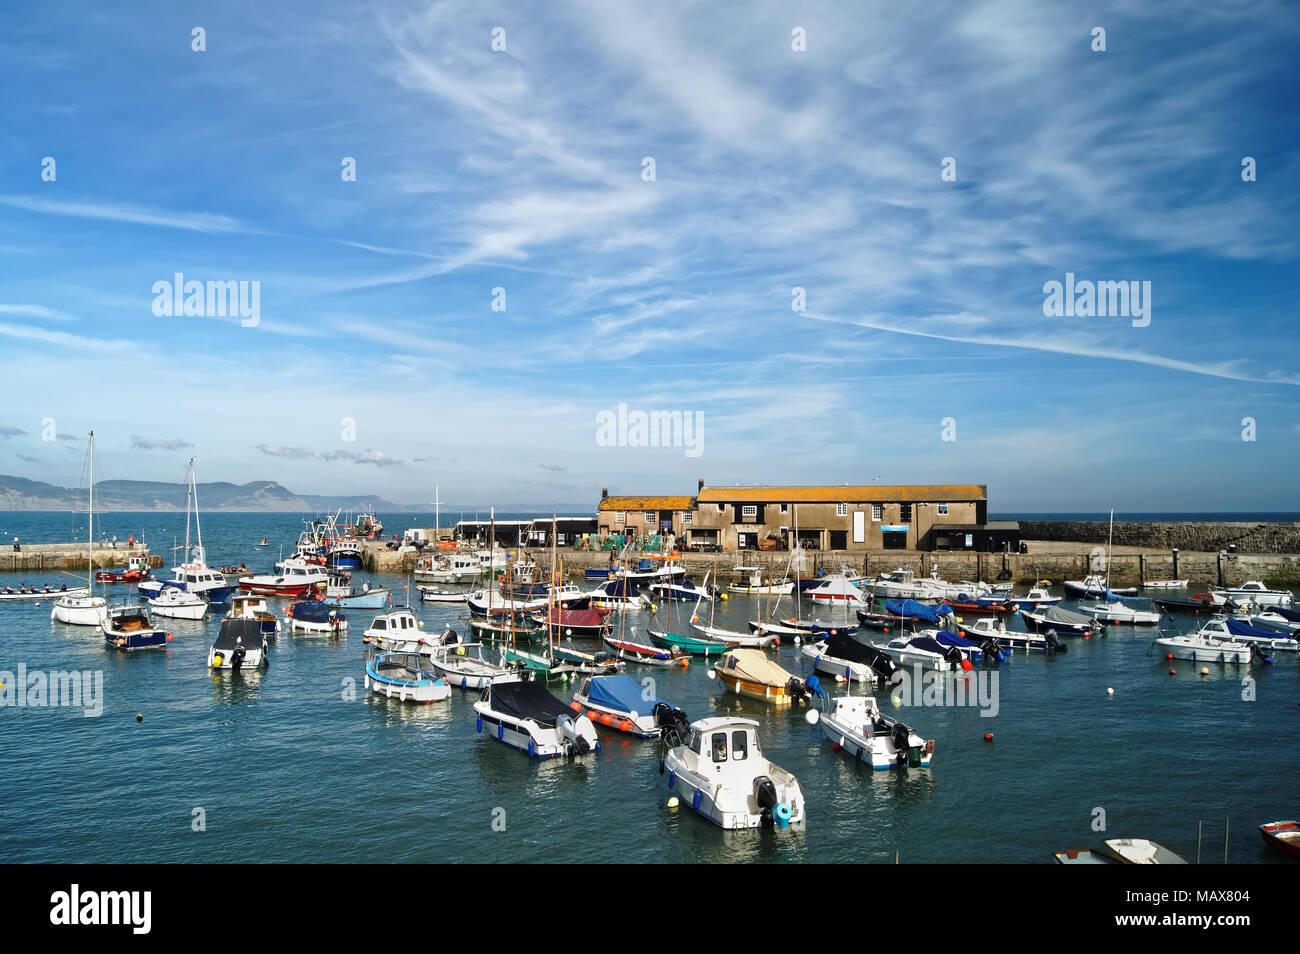 UK,Dorset,Lyme Regis,The Harbour and Aquarium with Jurassic Coast in the distance. - Stock Image